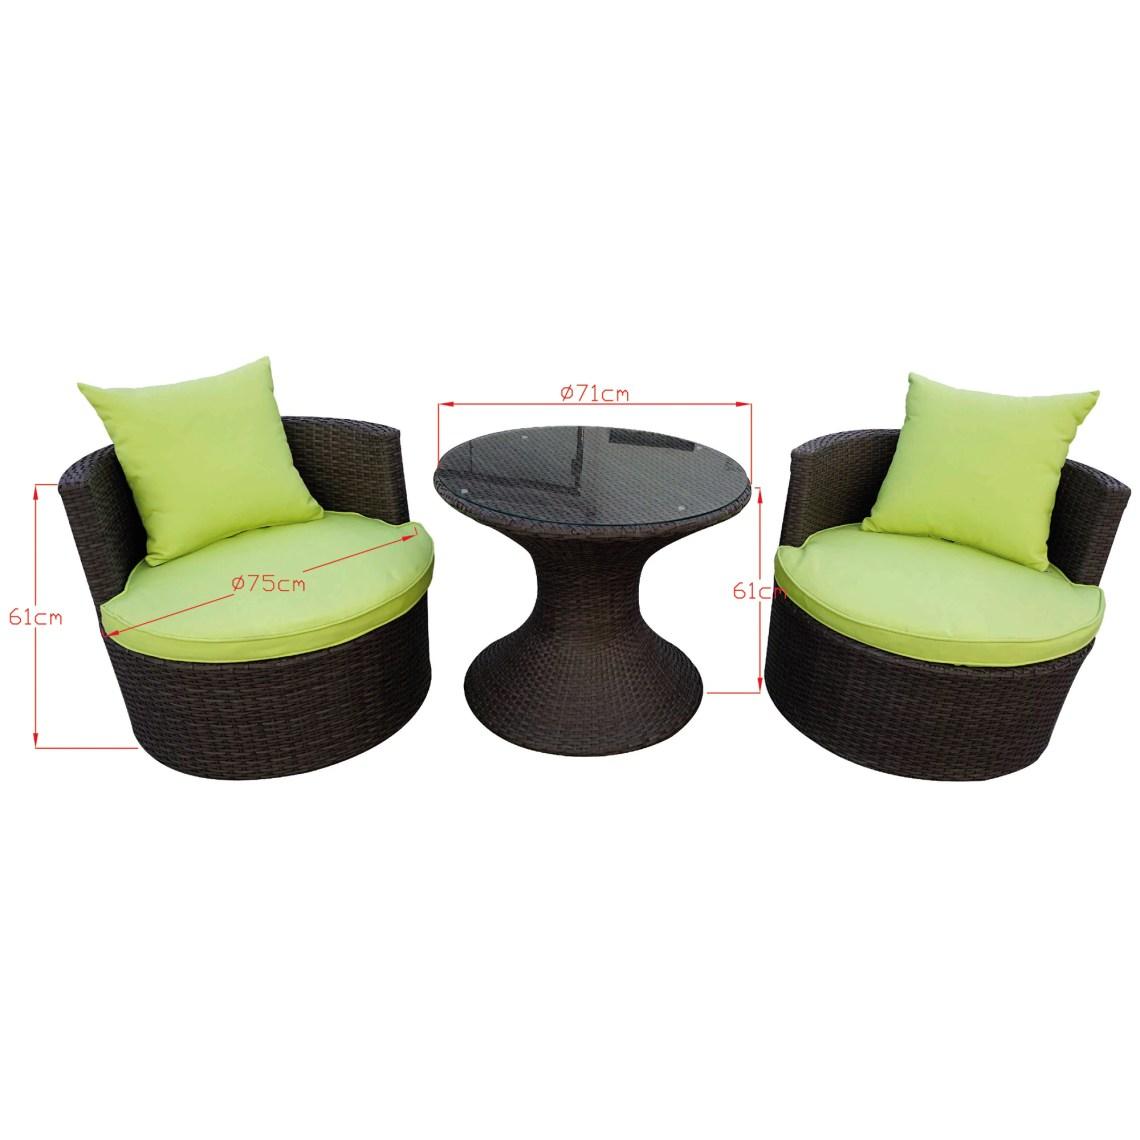 Set mobilier balcon/gradina/terasa Kring Duo, masa, 2 fotolii, ratan sintetic, maro si perne verzi